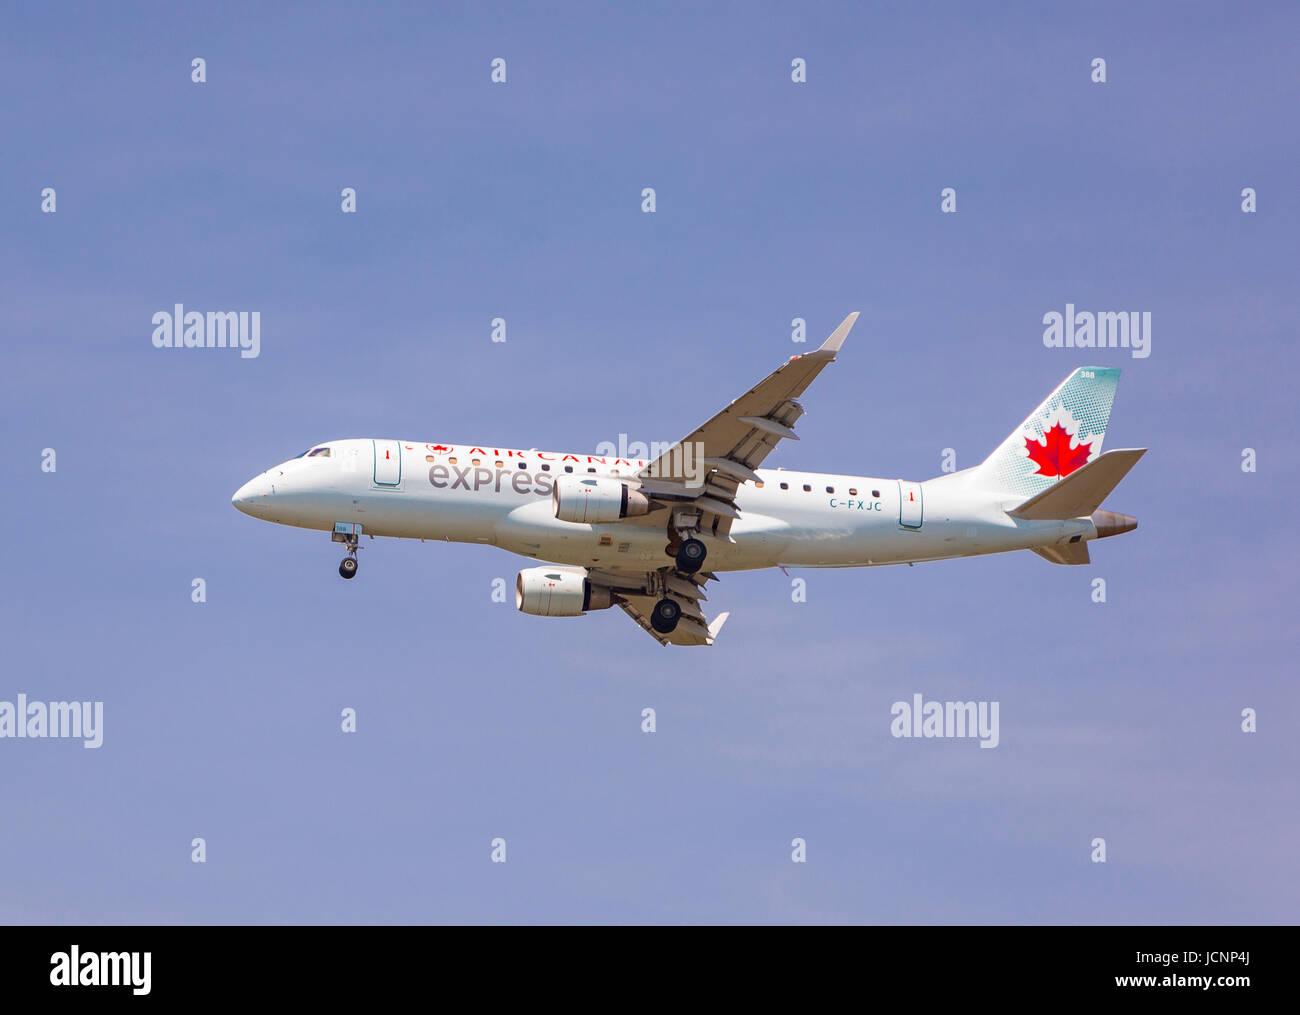 WASHINGTON, DC, USA - Air Canada jetliner approaches Reagan National Airport DCA. - Stock Image